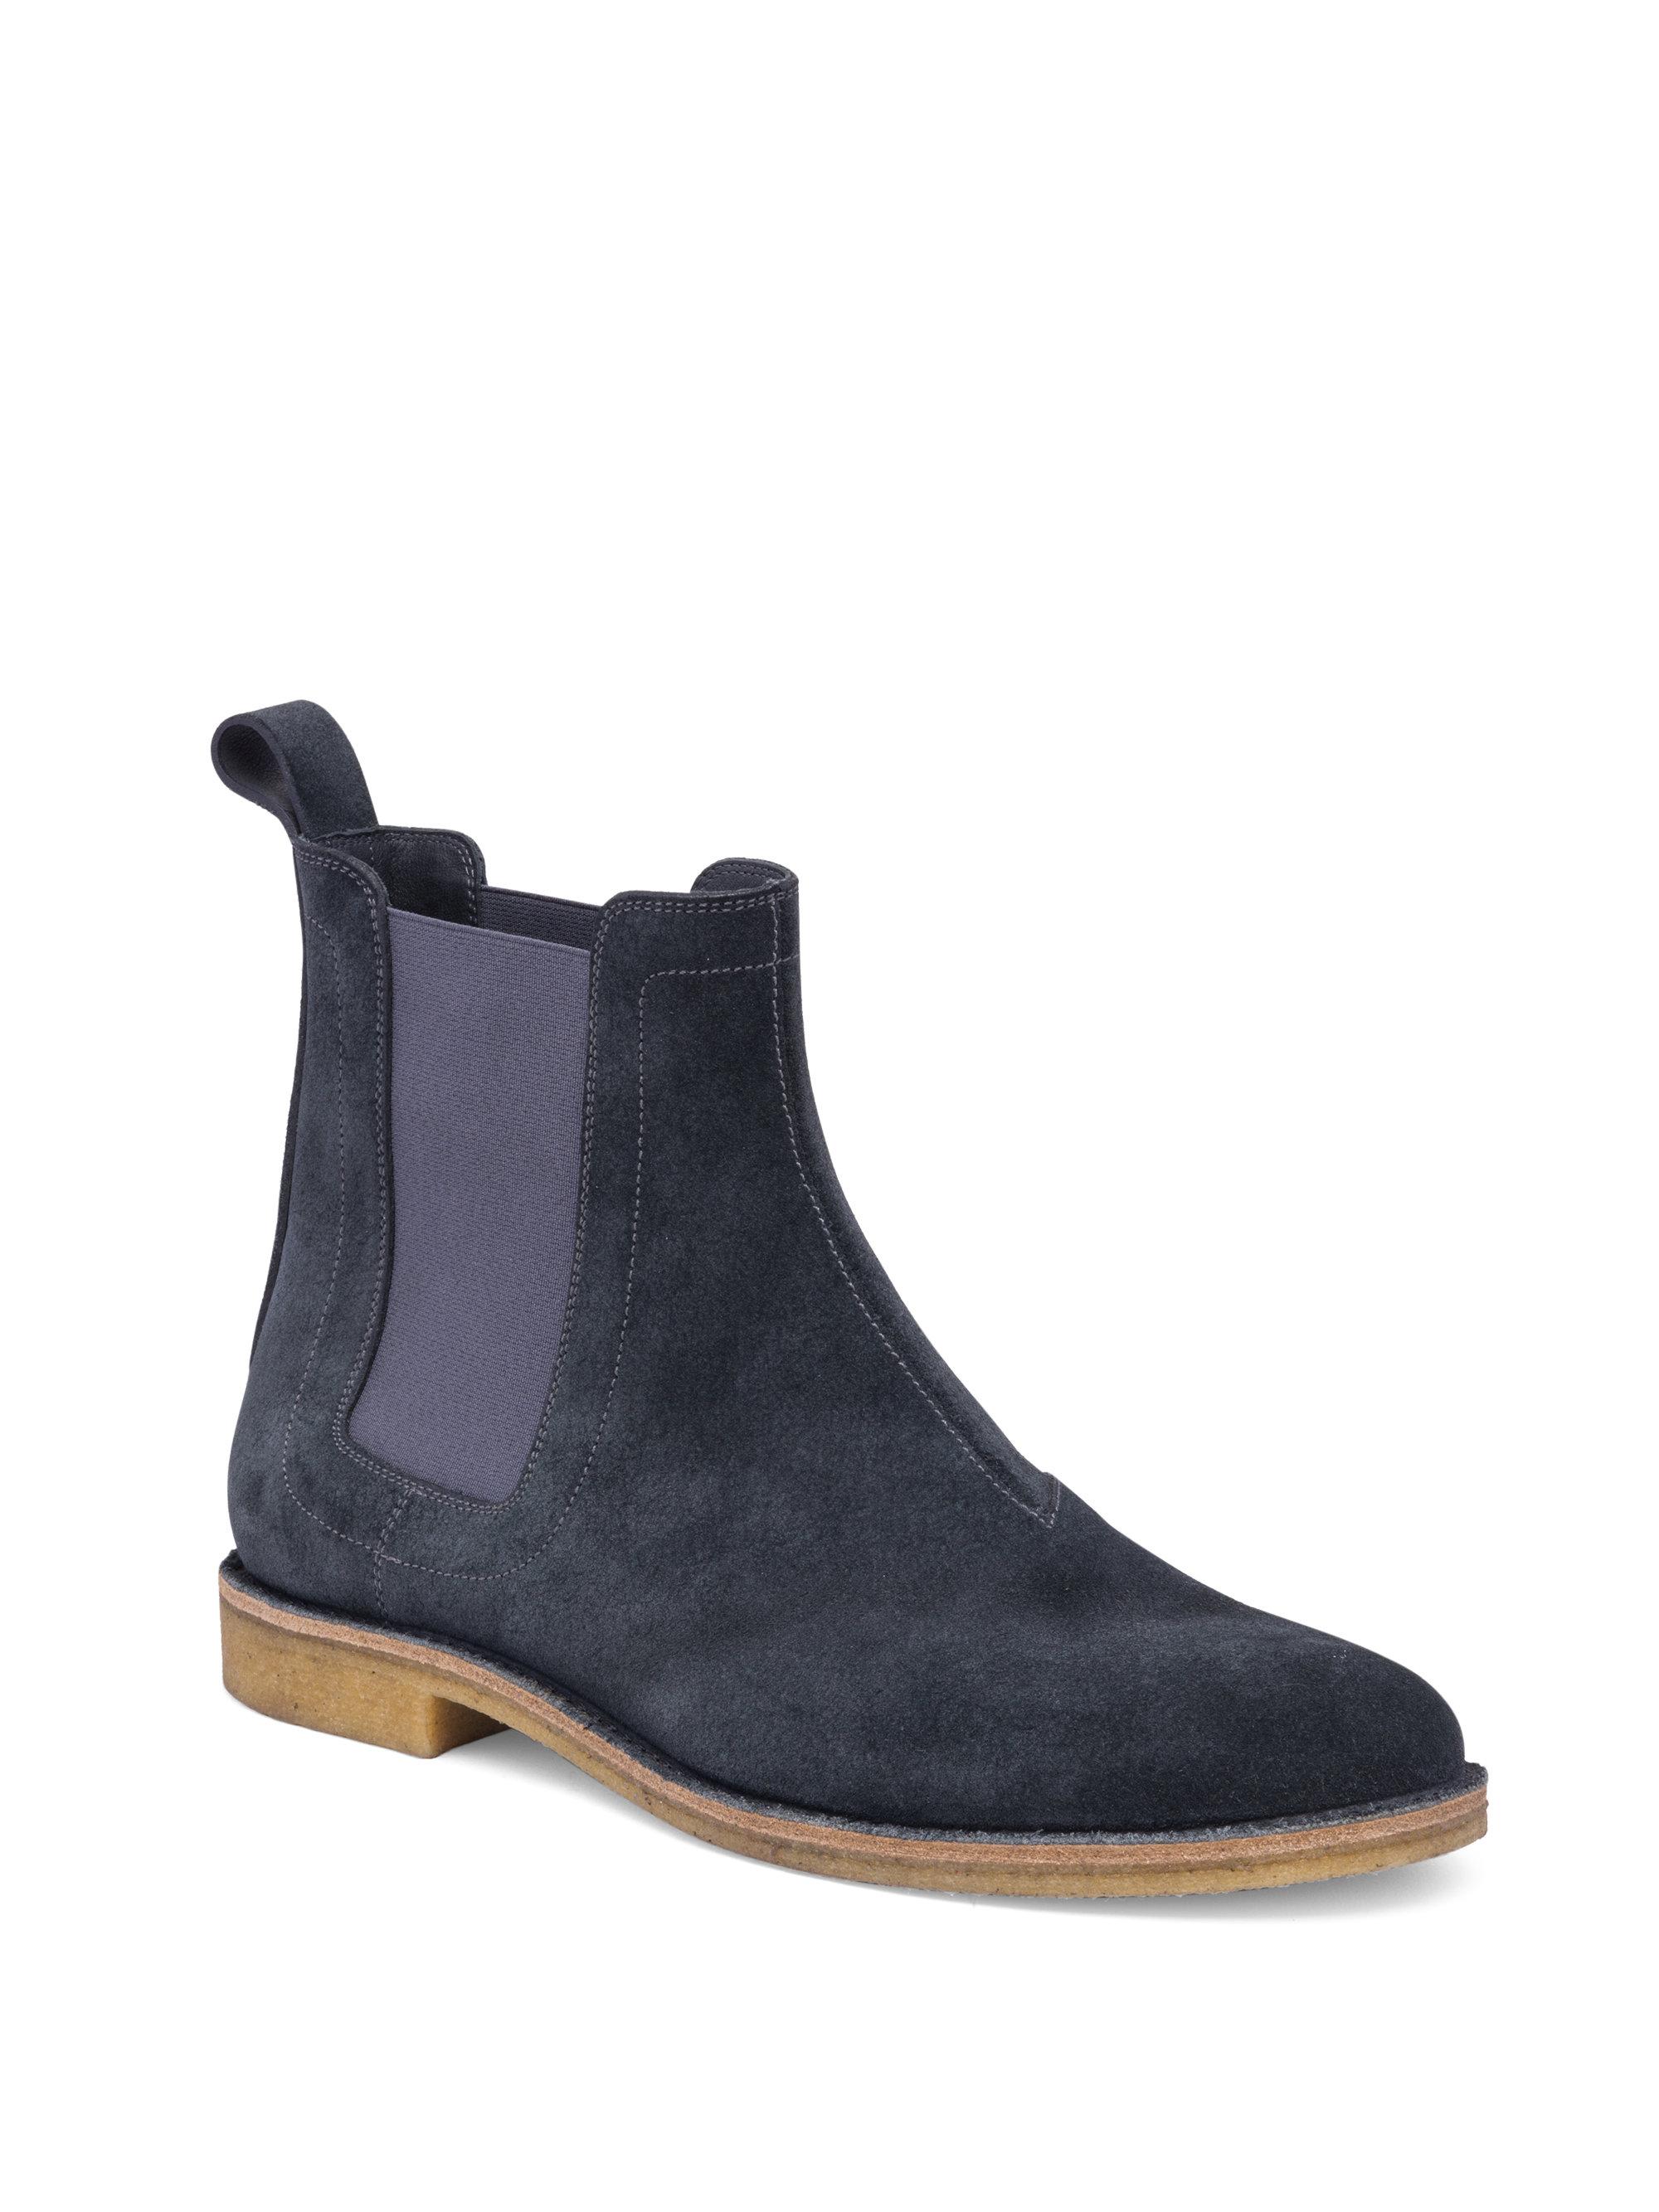 Lastest Bottega Veneta Womens Brogue Chelsea Boots  Befablook